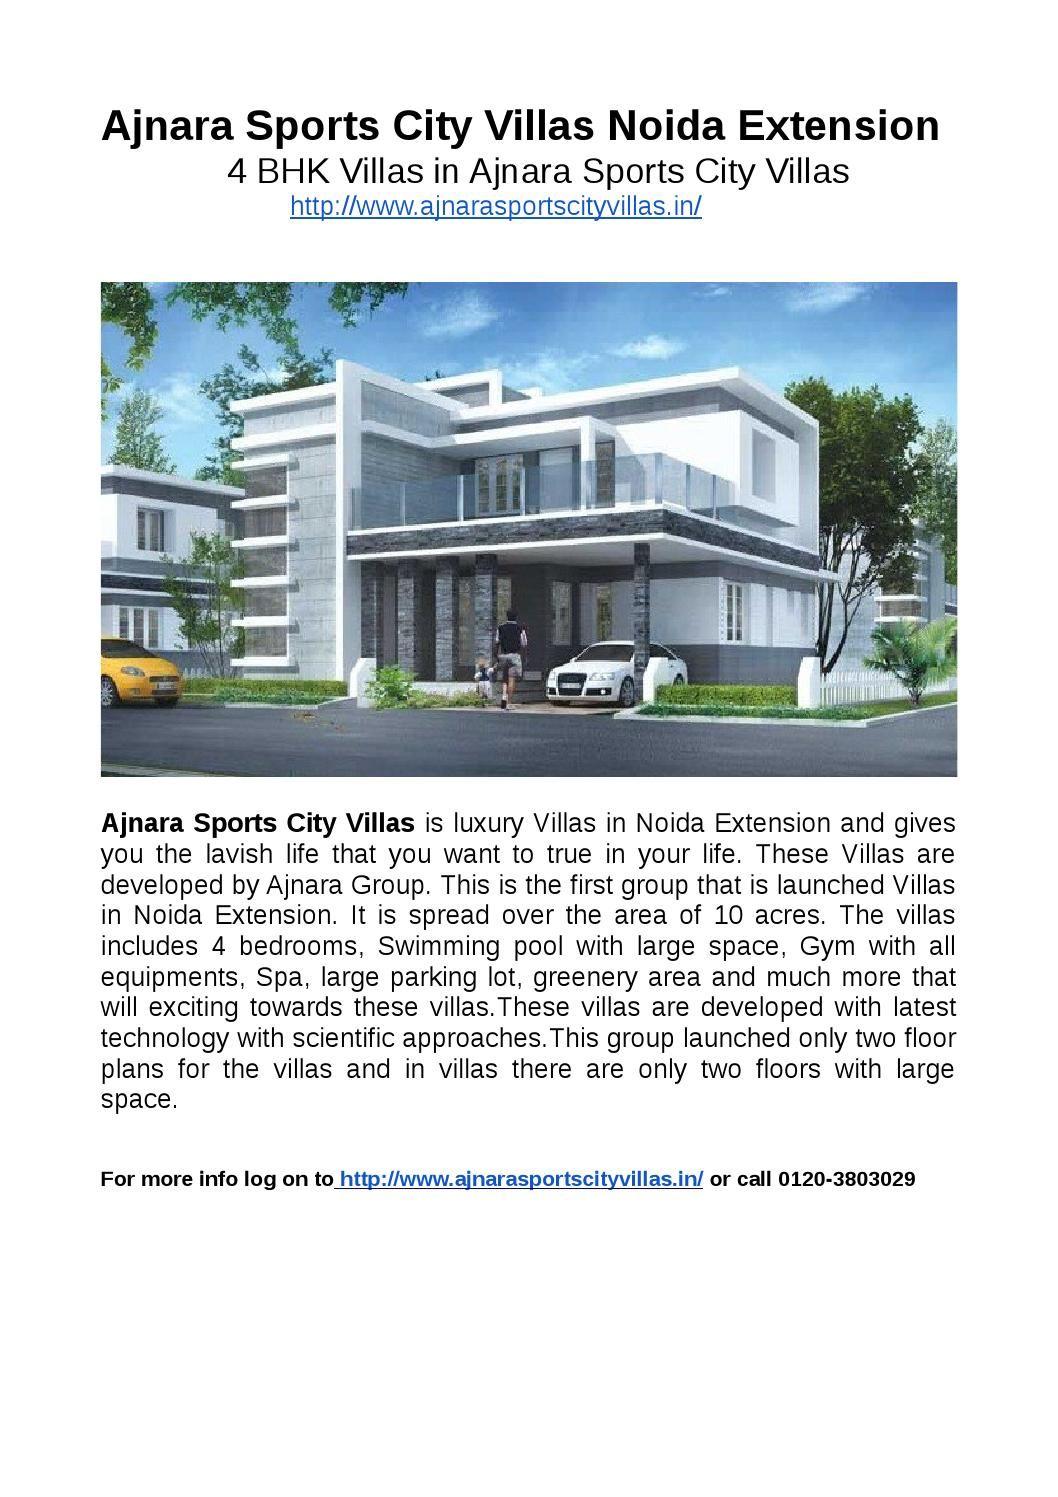 4 Bhk Villas In Ajnara Sports City Villas Villa City Luxury Villa